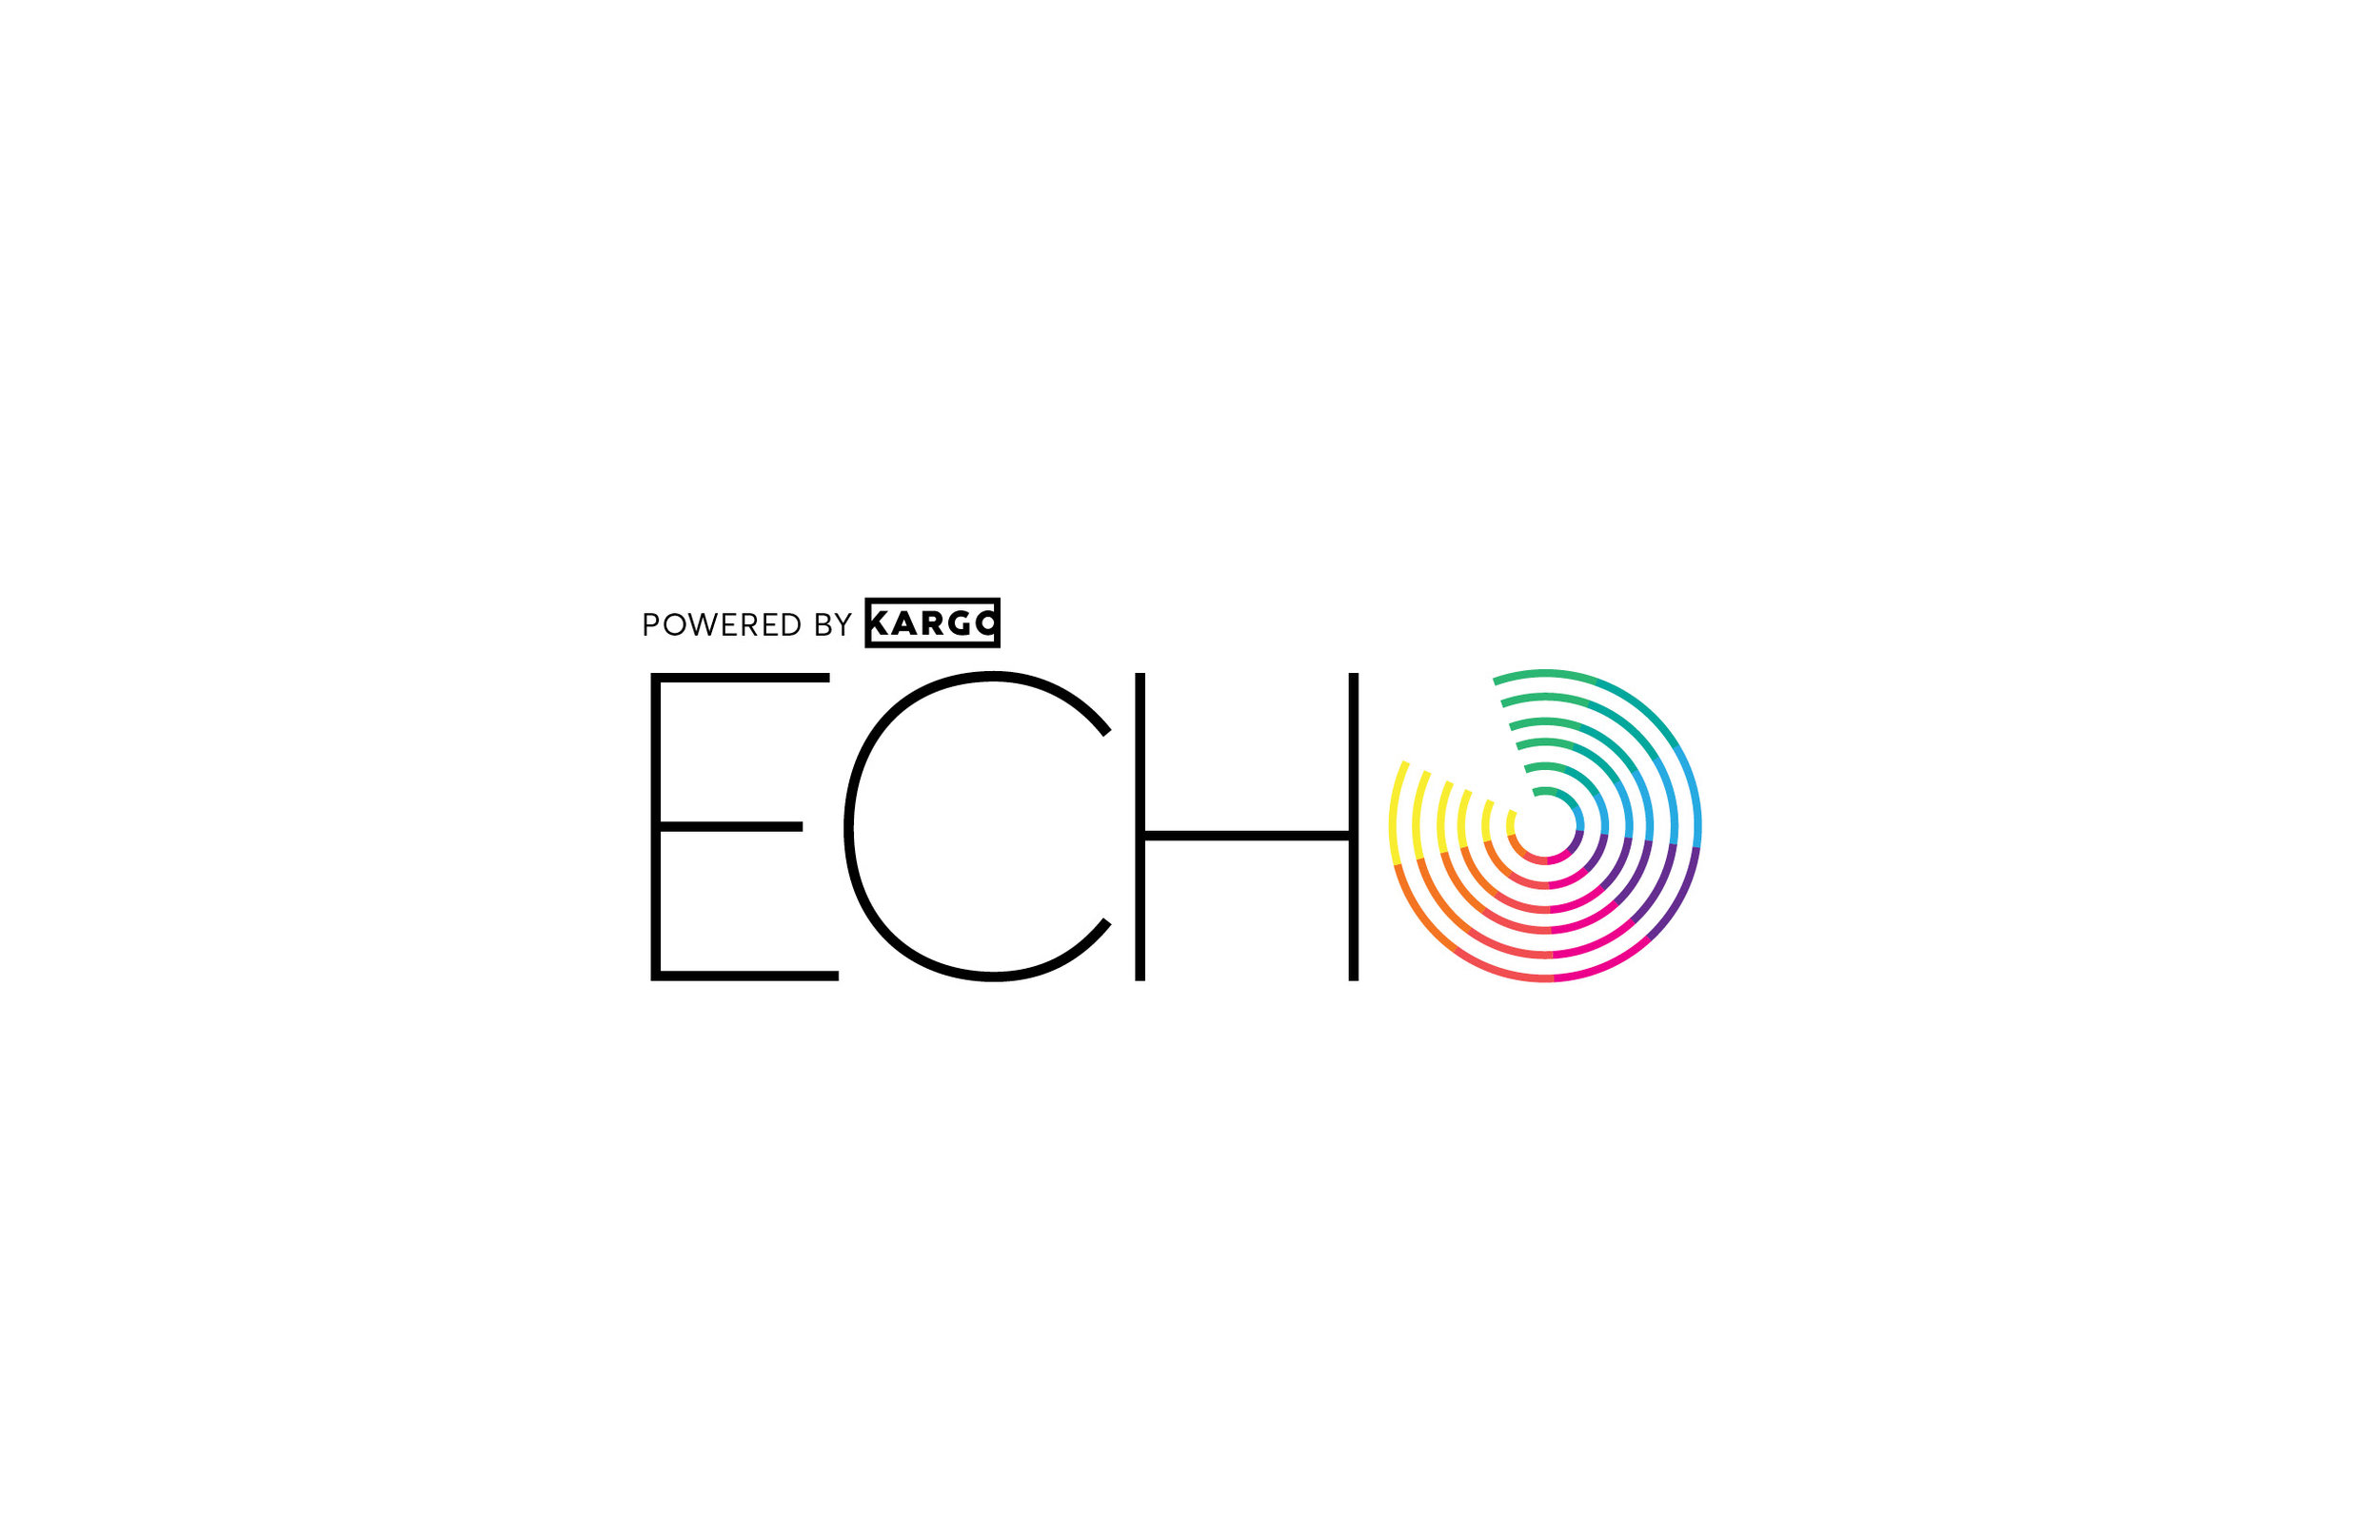 01_echo logos.jpg